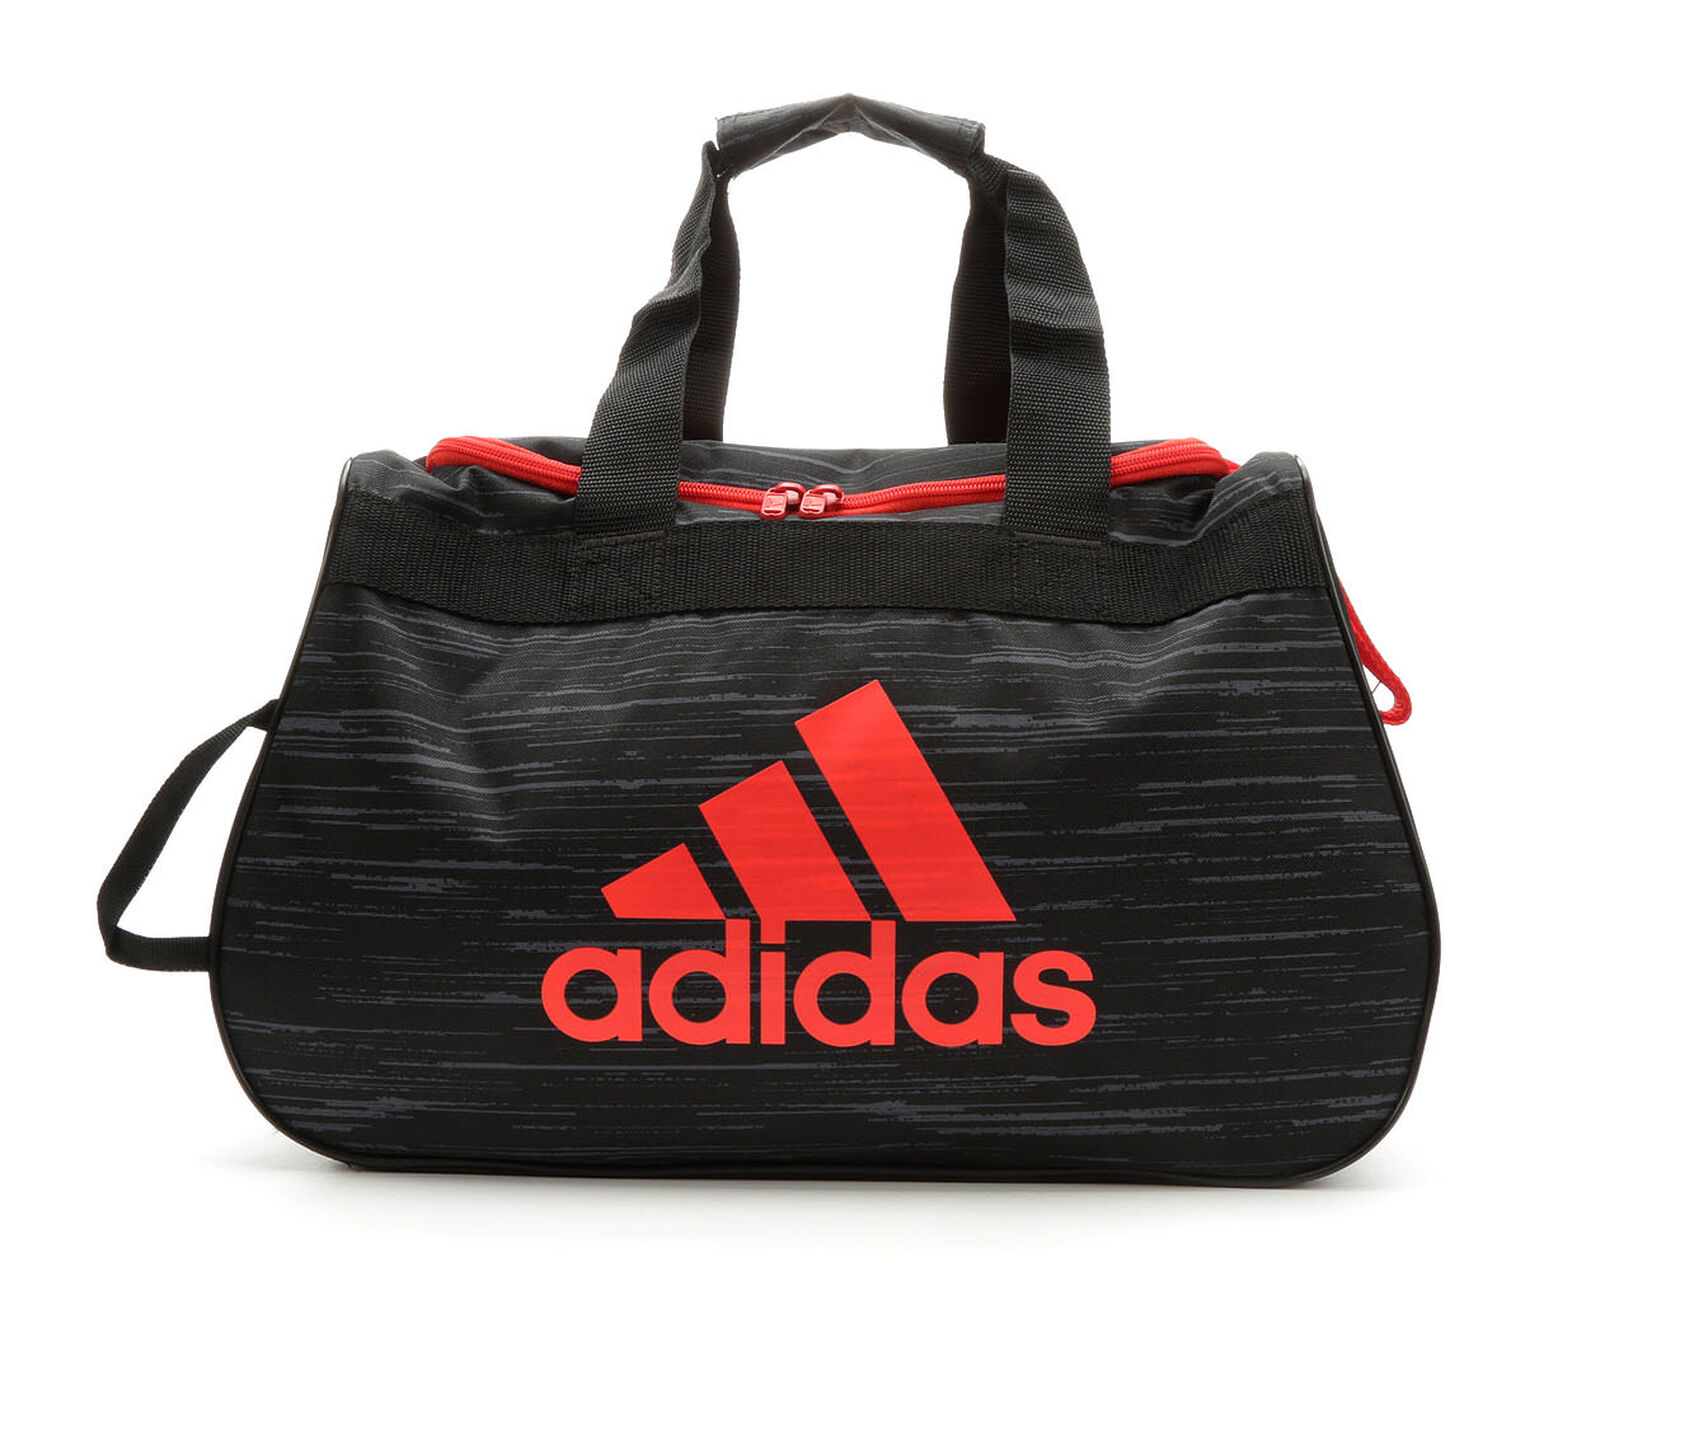 24d744fba014 Adidas Diablo Small Duffel Bag. Previous